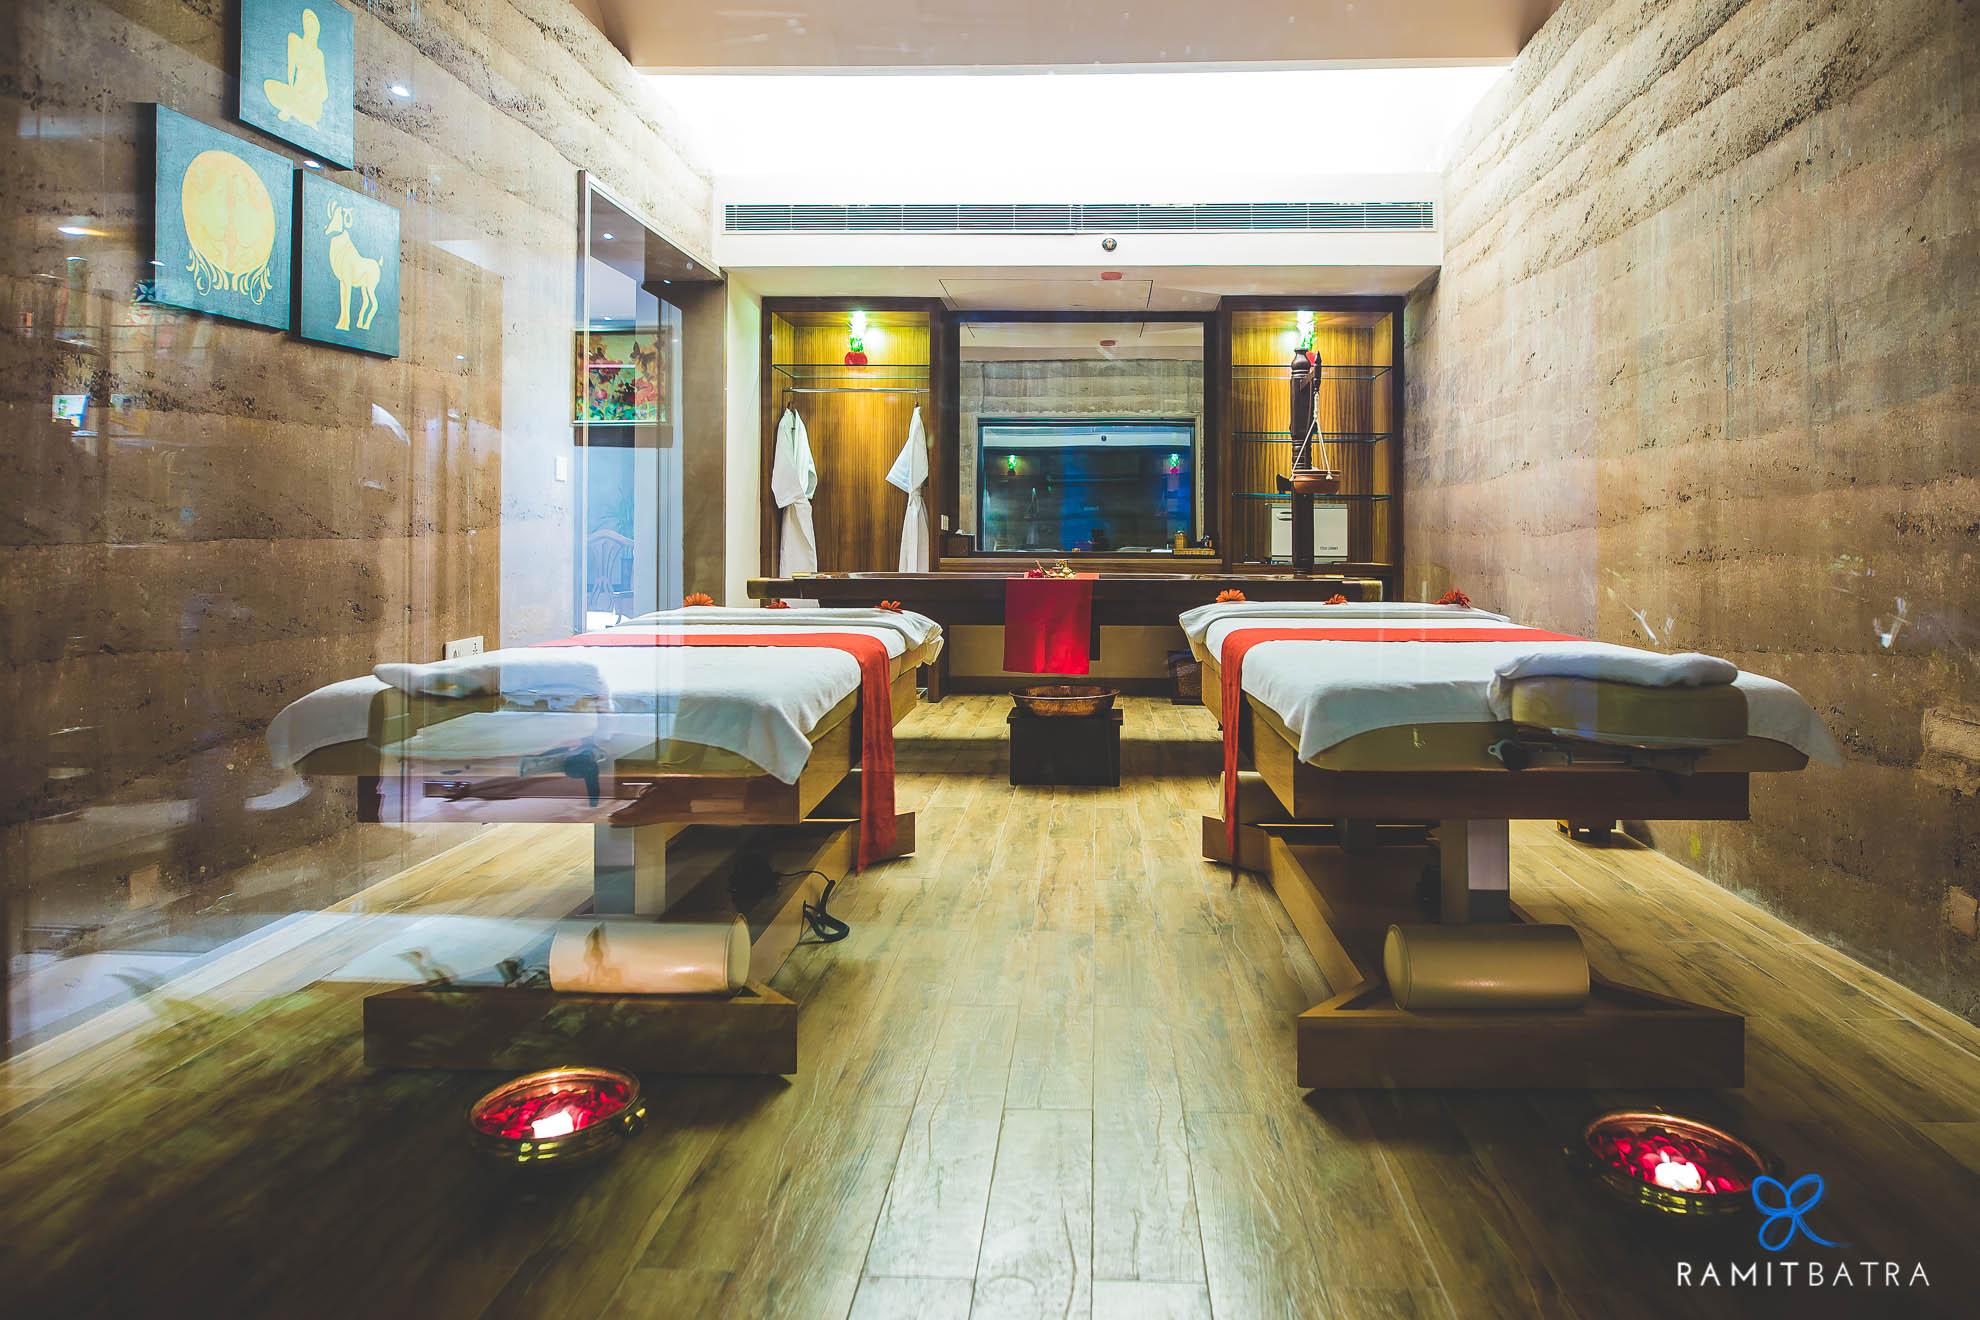 lalit-mangar-hotel-near-delhi-ramitbatra-036